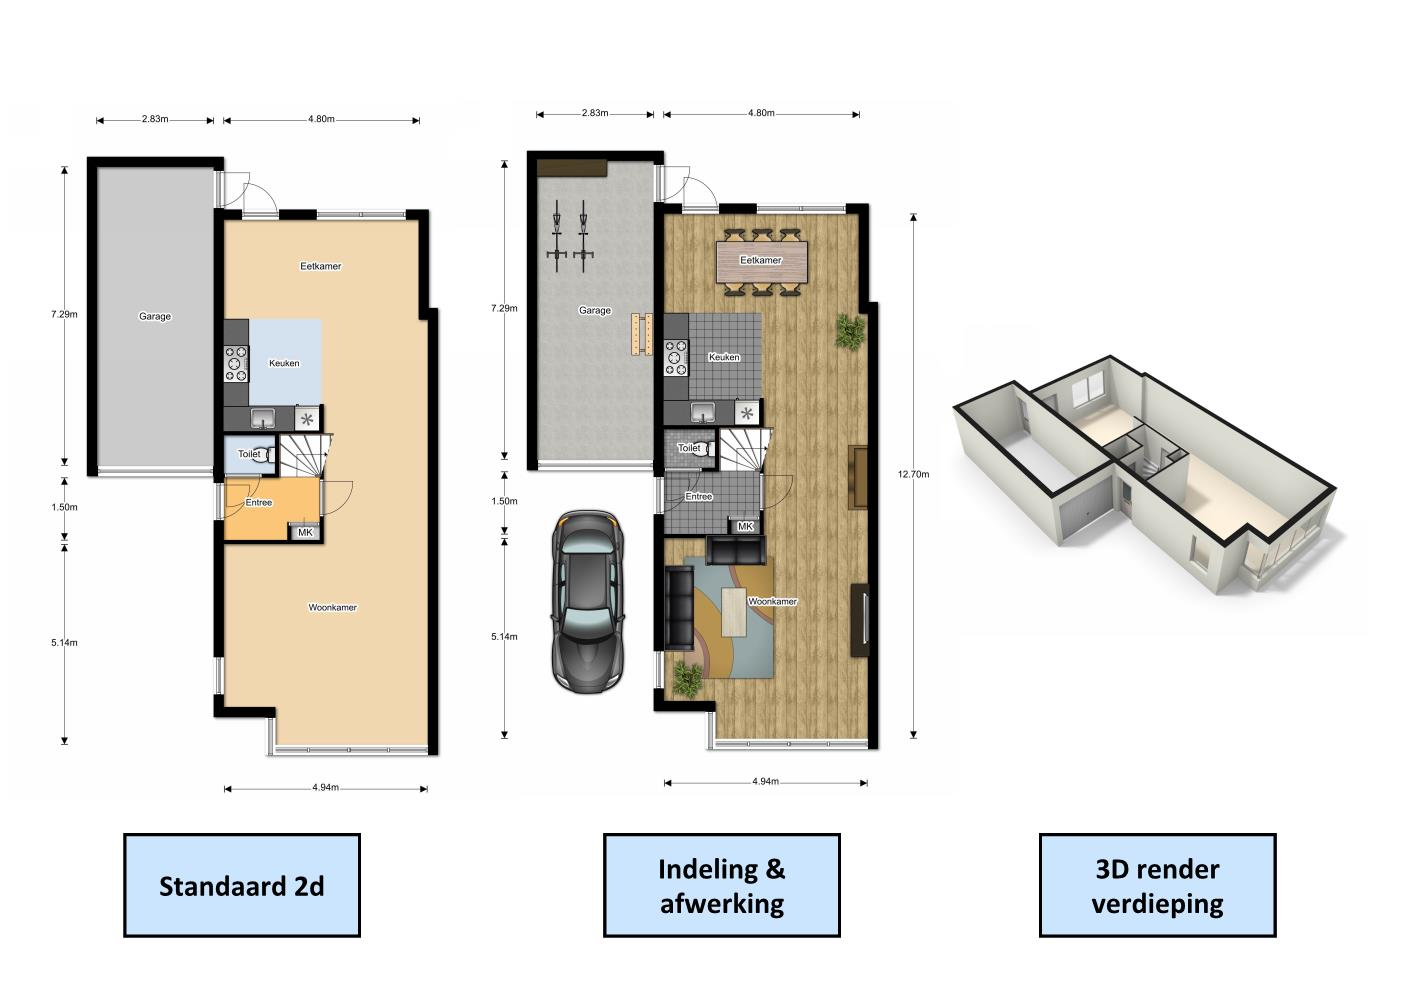 Floorplanner funda tekening